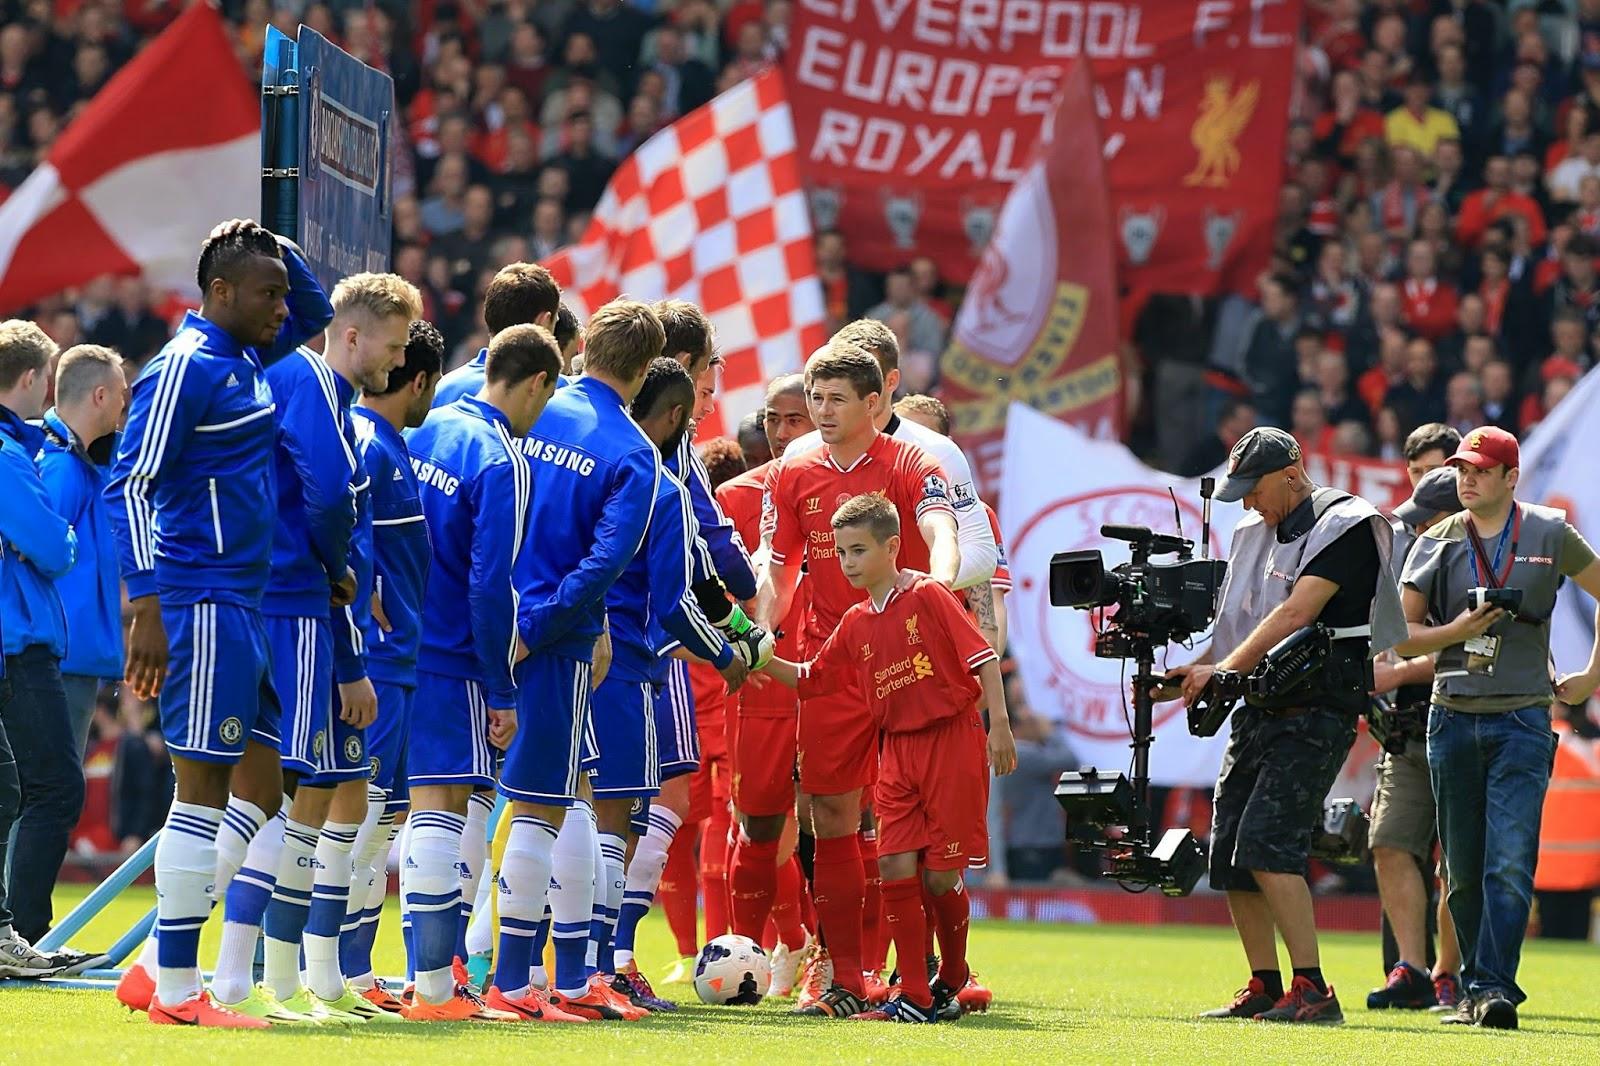 Skuad Liverpool dan Chelse bejabat tangan sebelum pertandingan dimulai